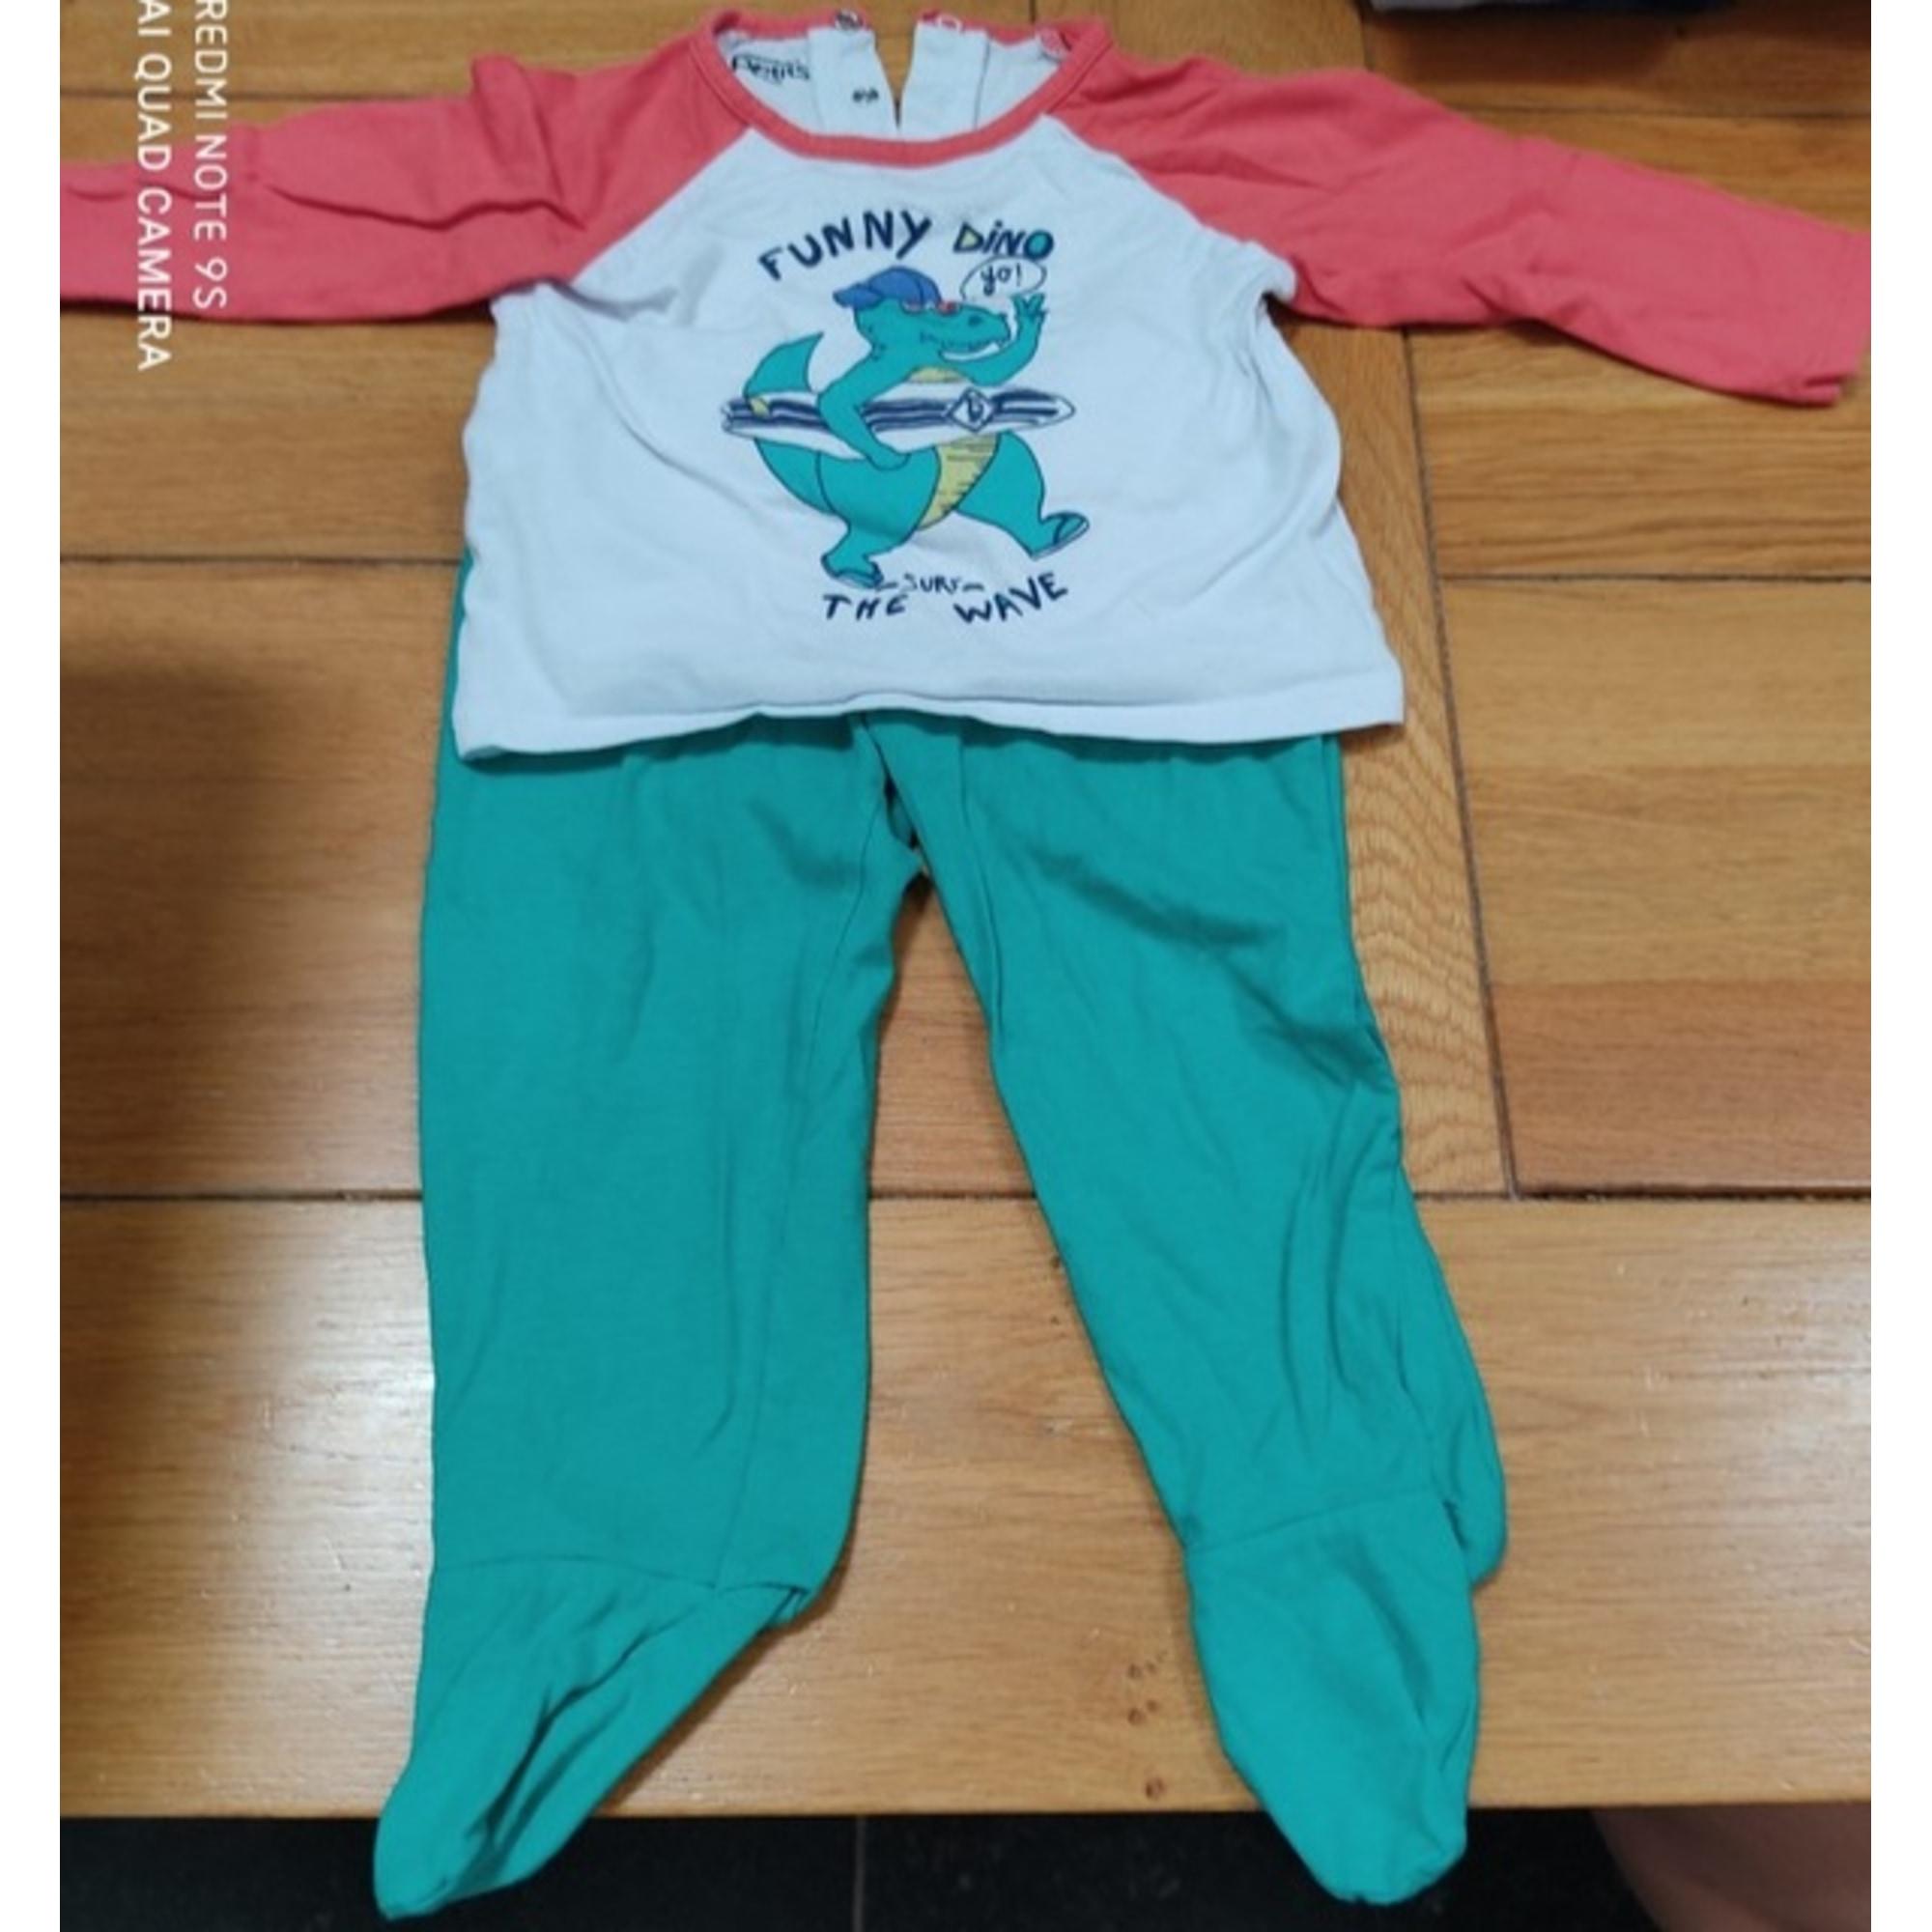 Pyjama LA COMPAGNIE DES PETITS Vert